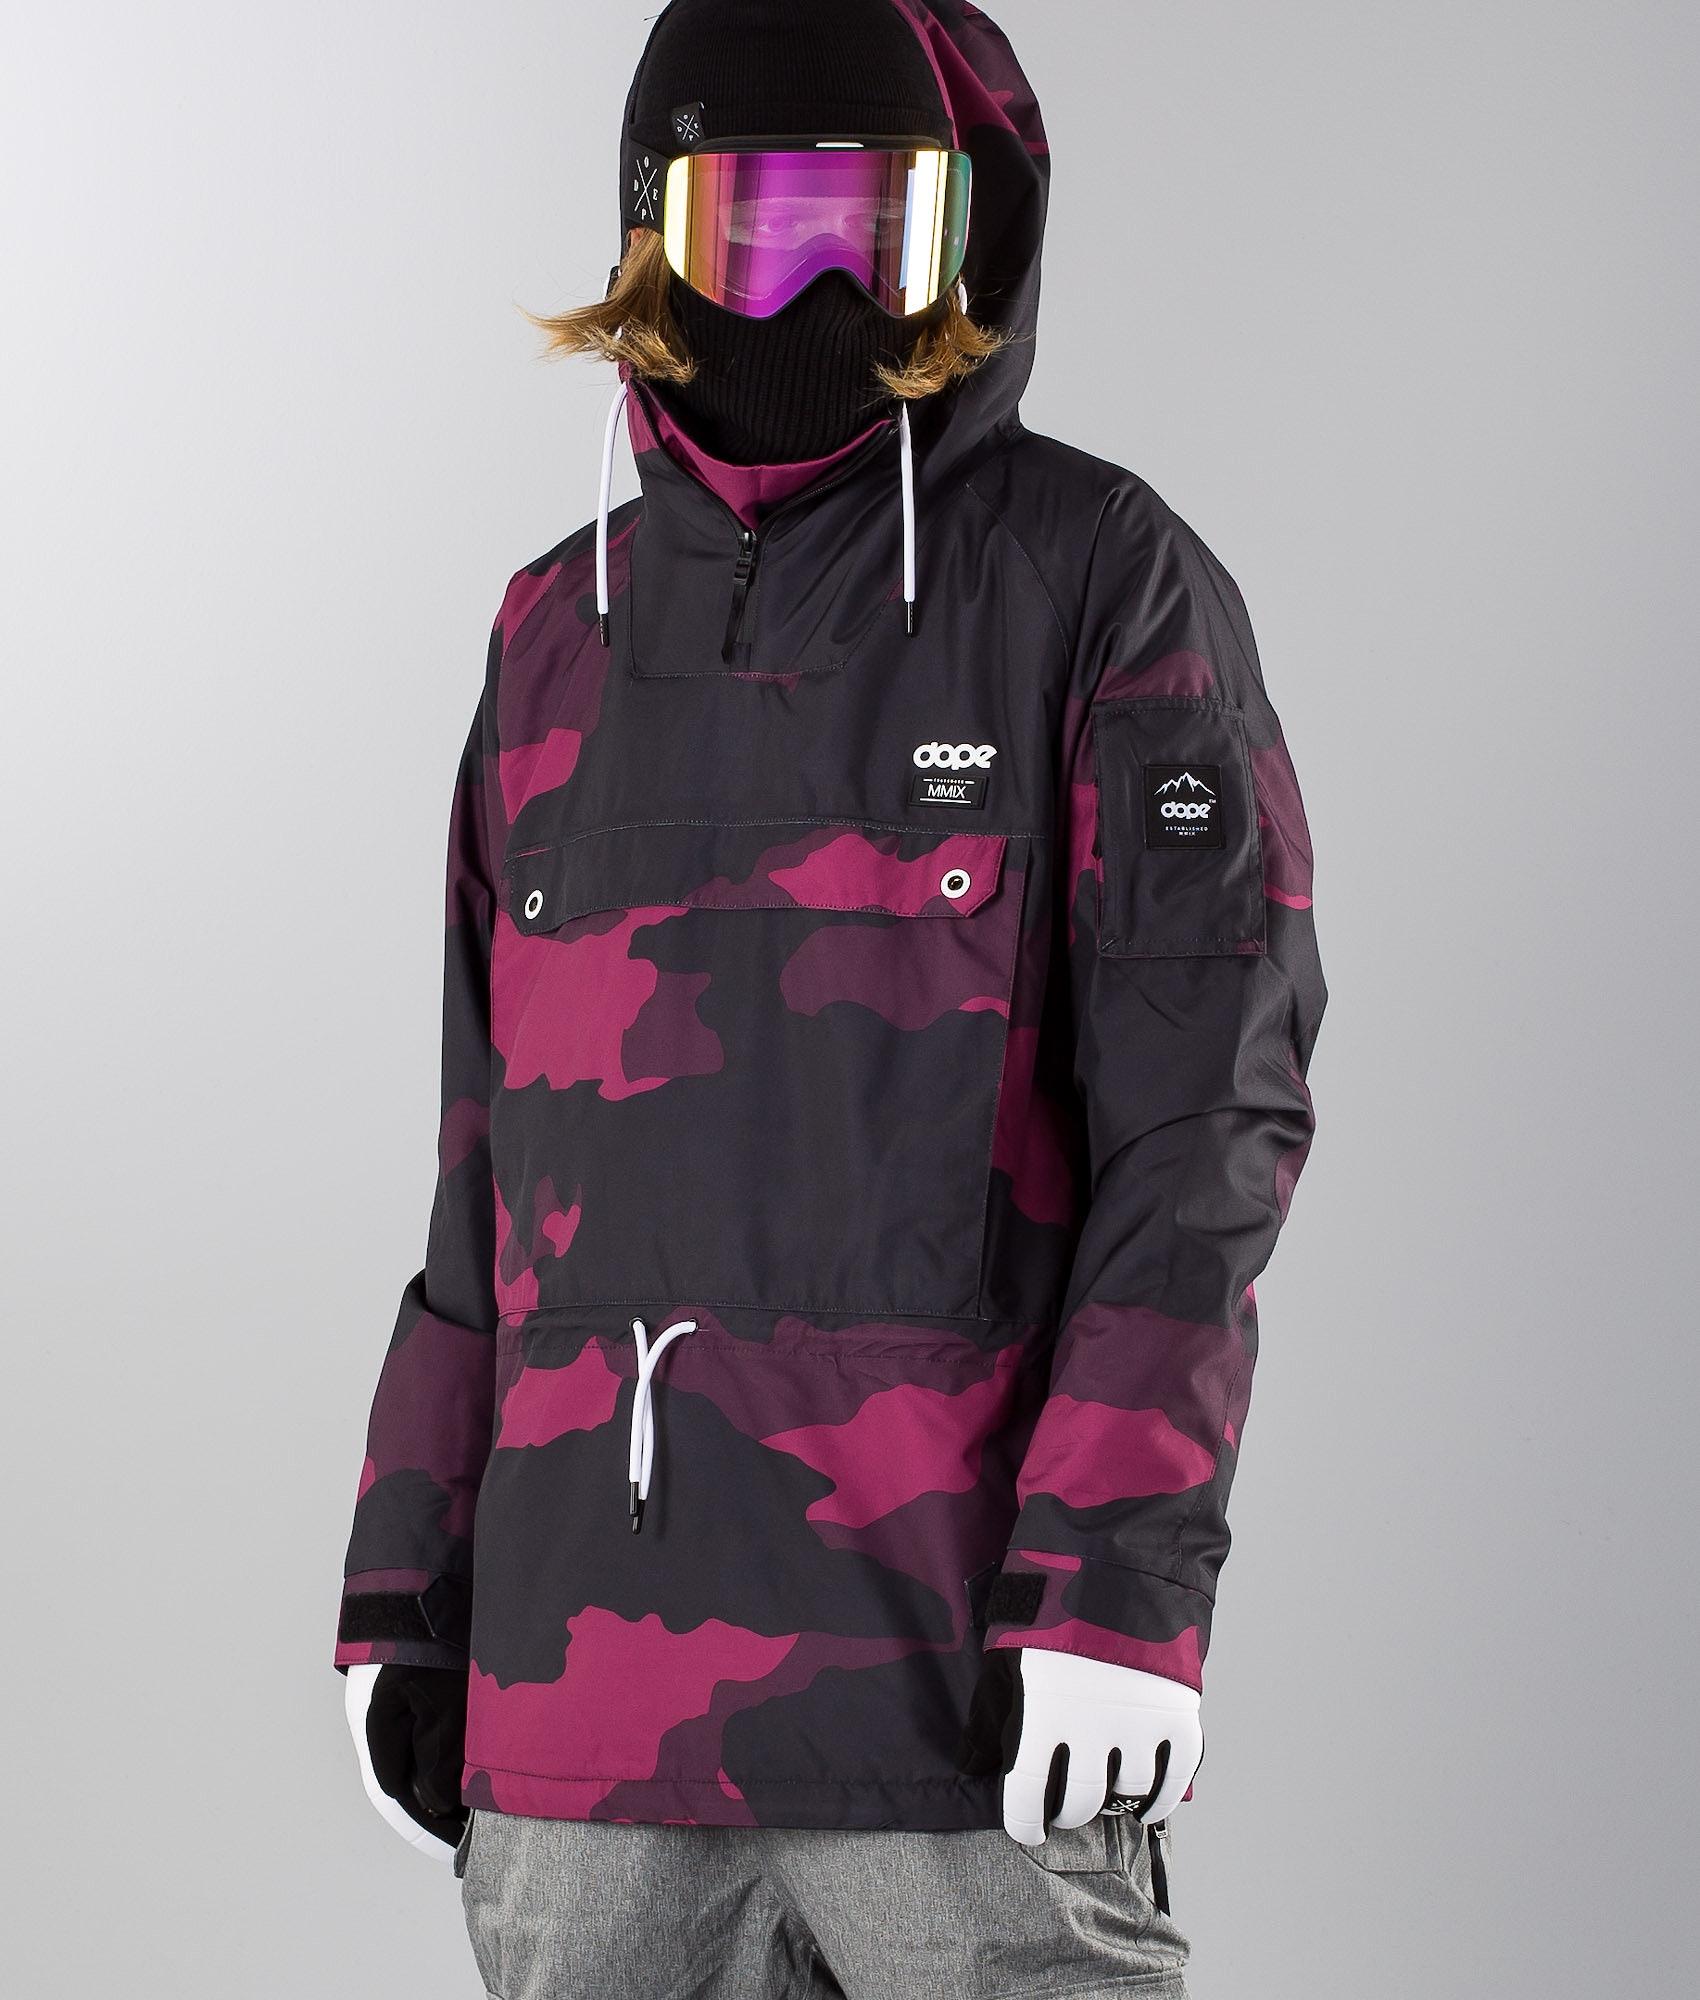 9c56c11d Dope Annok Skijakke Purple Camo - Ridestore.no